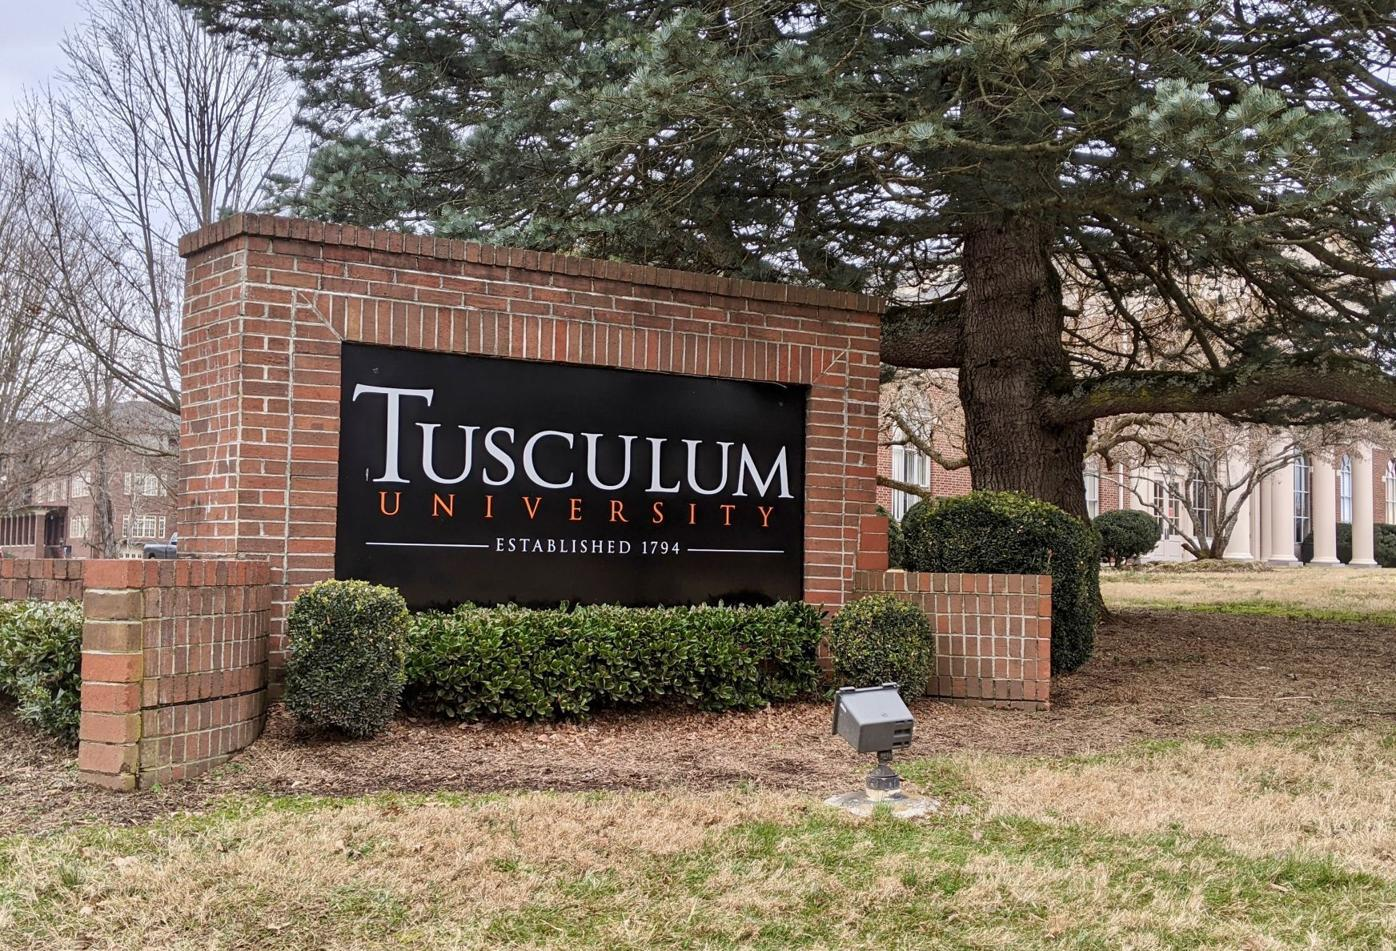 tusculumcrop - 1.jpg (copy)